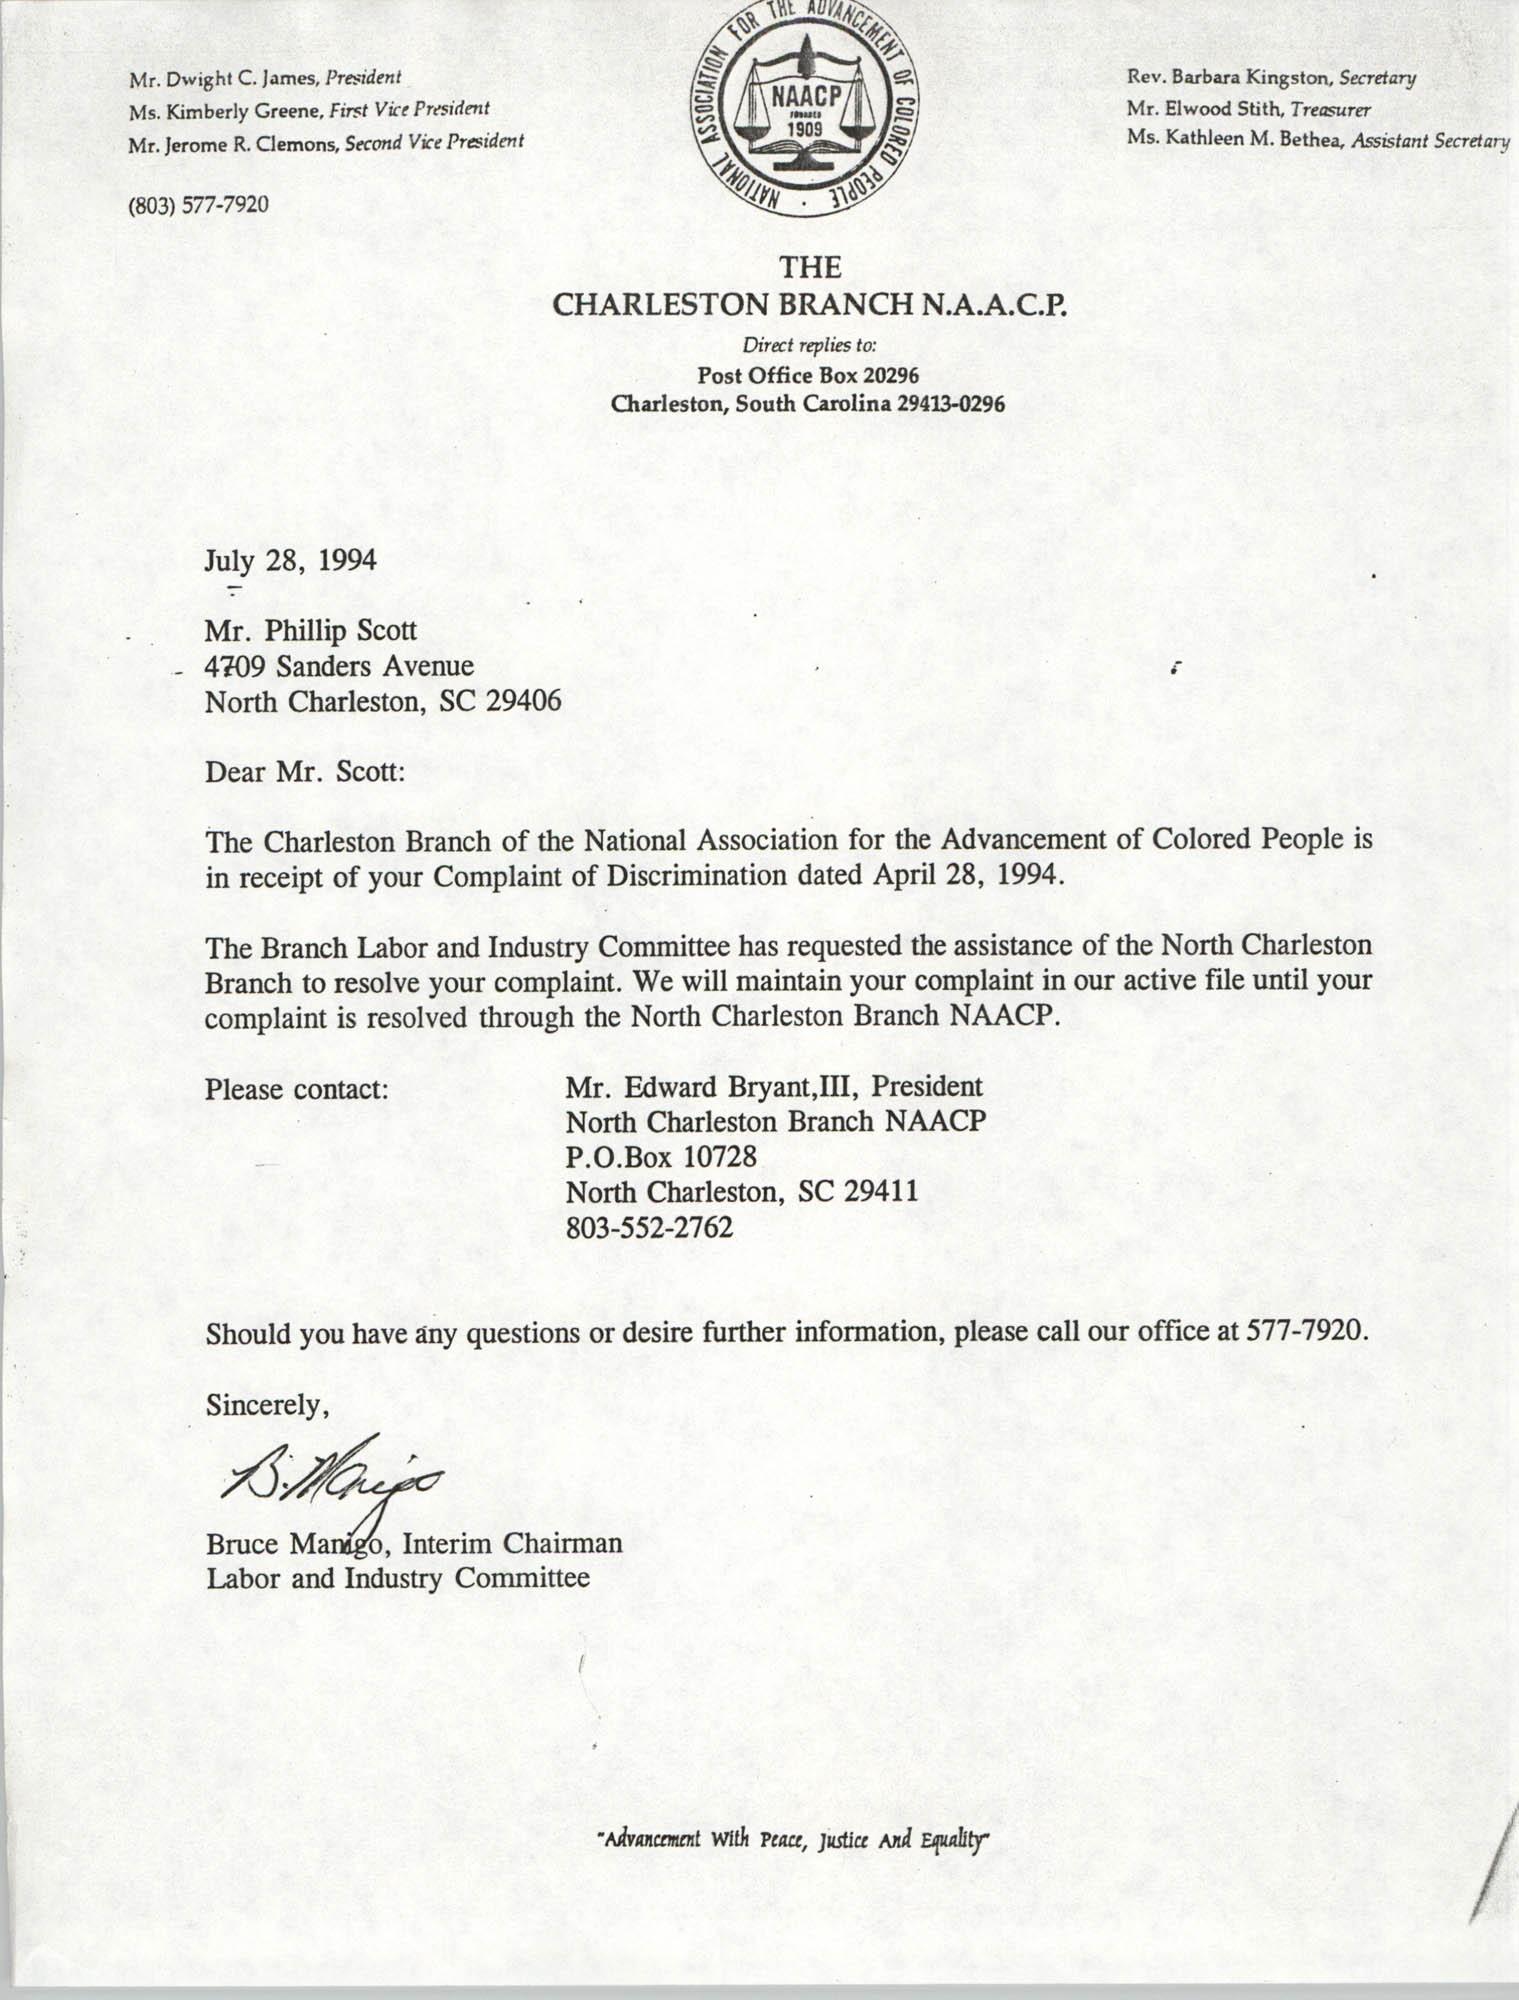 Letter from Bruce Manigo to Phillip Scott, July 28, 1994